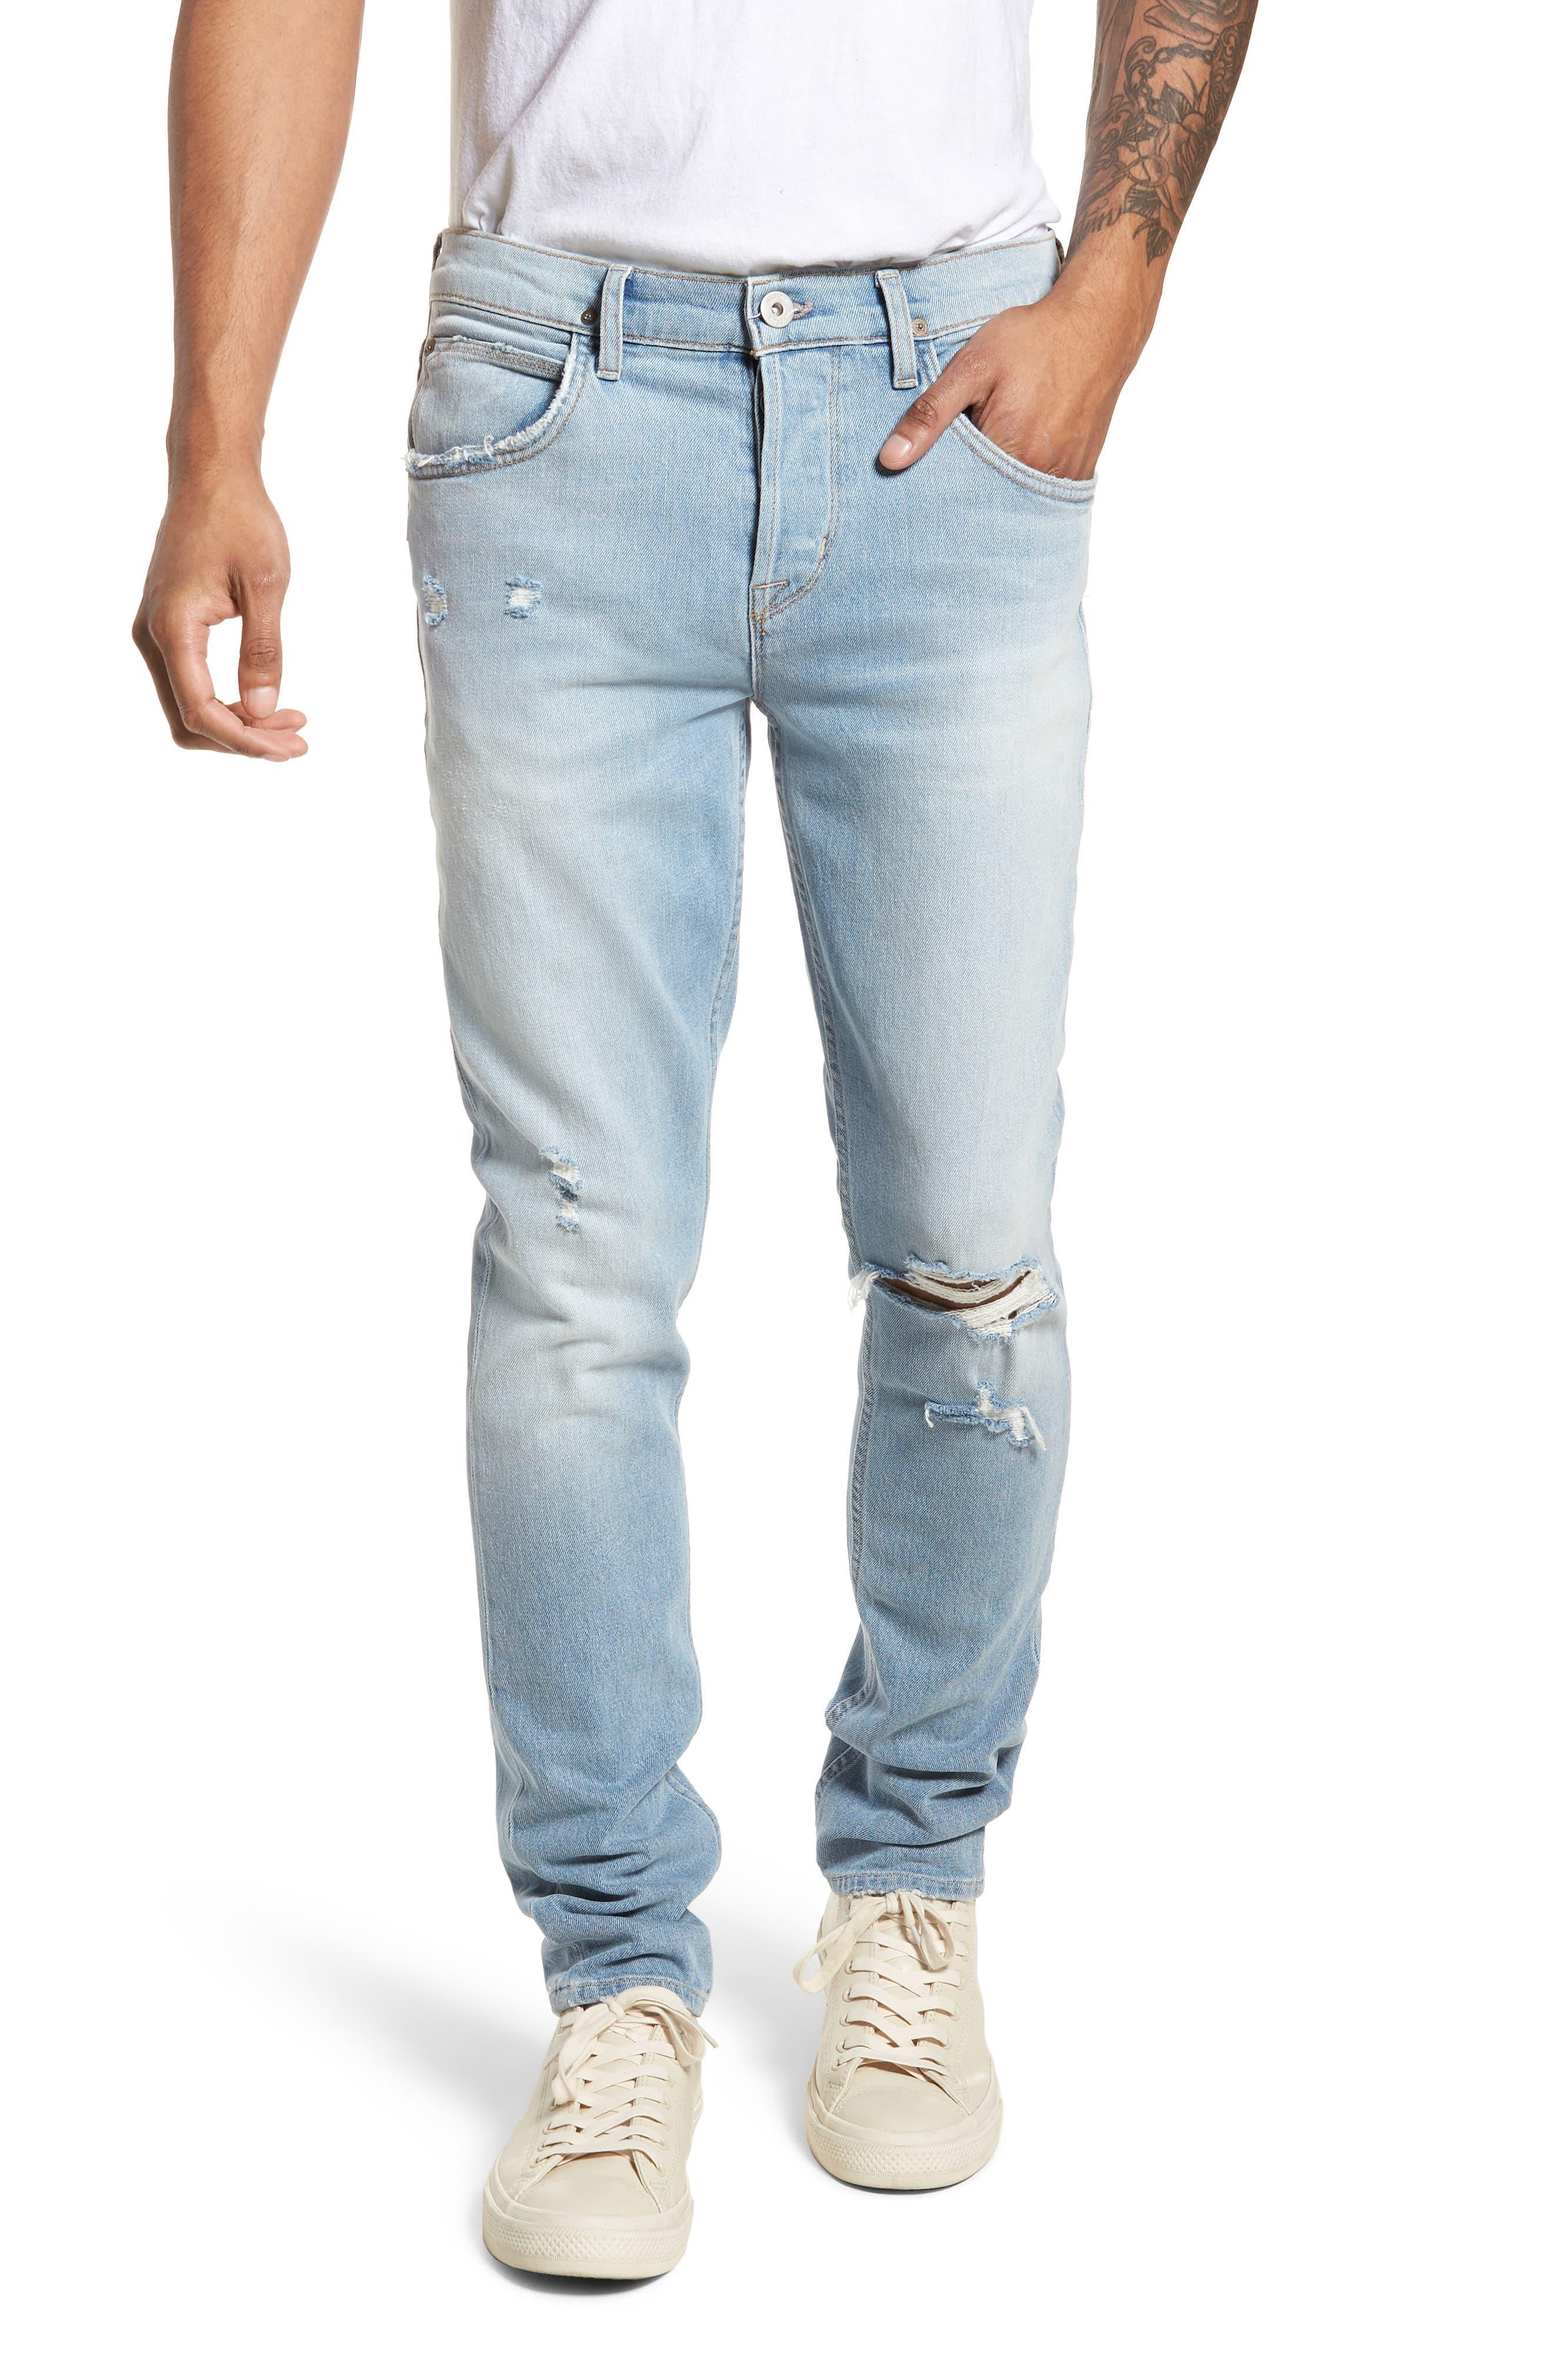 Axl Skinny Fit Jeans,                         Main,                         color, Blaze